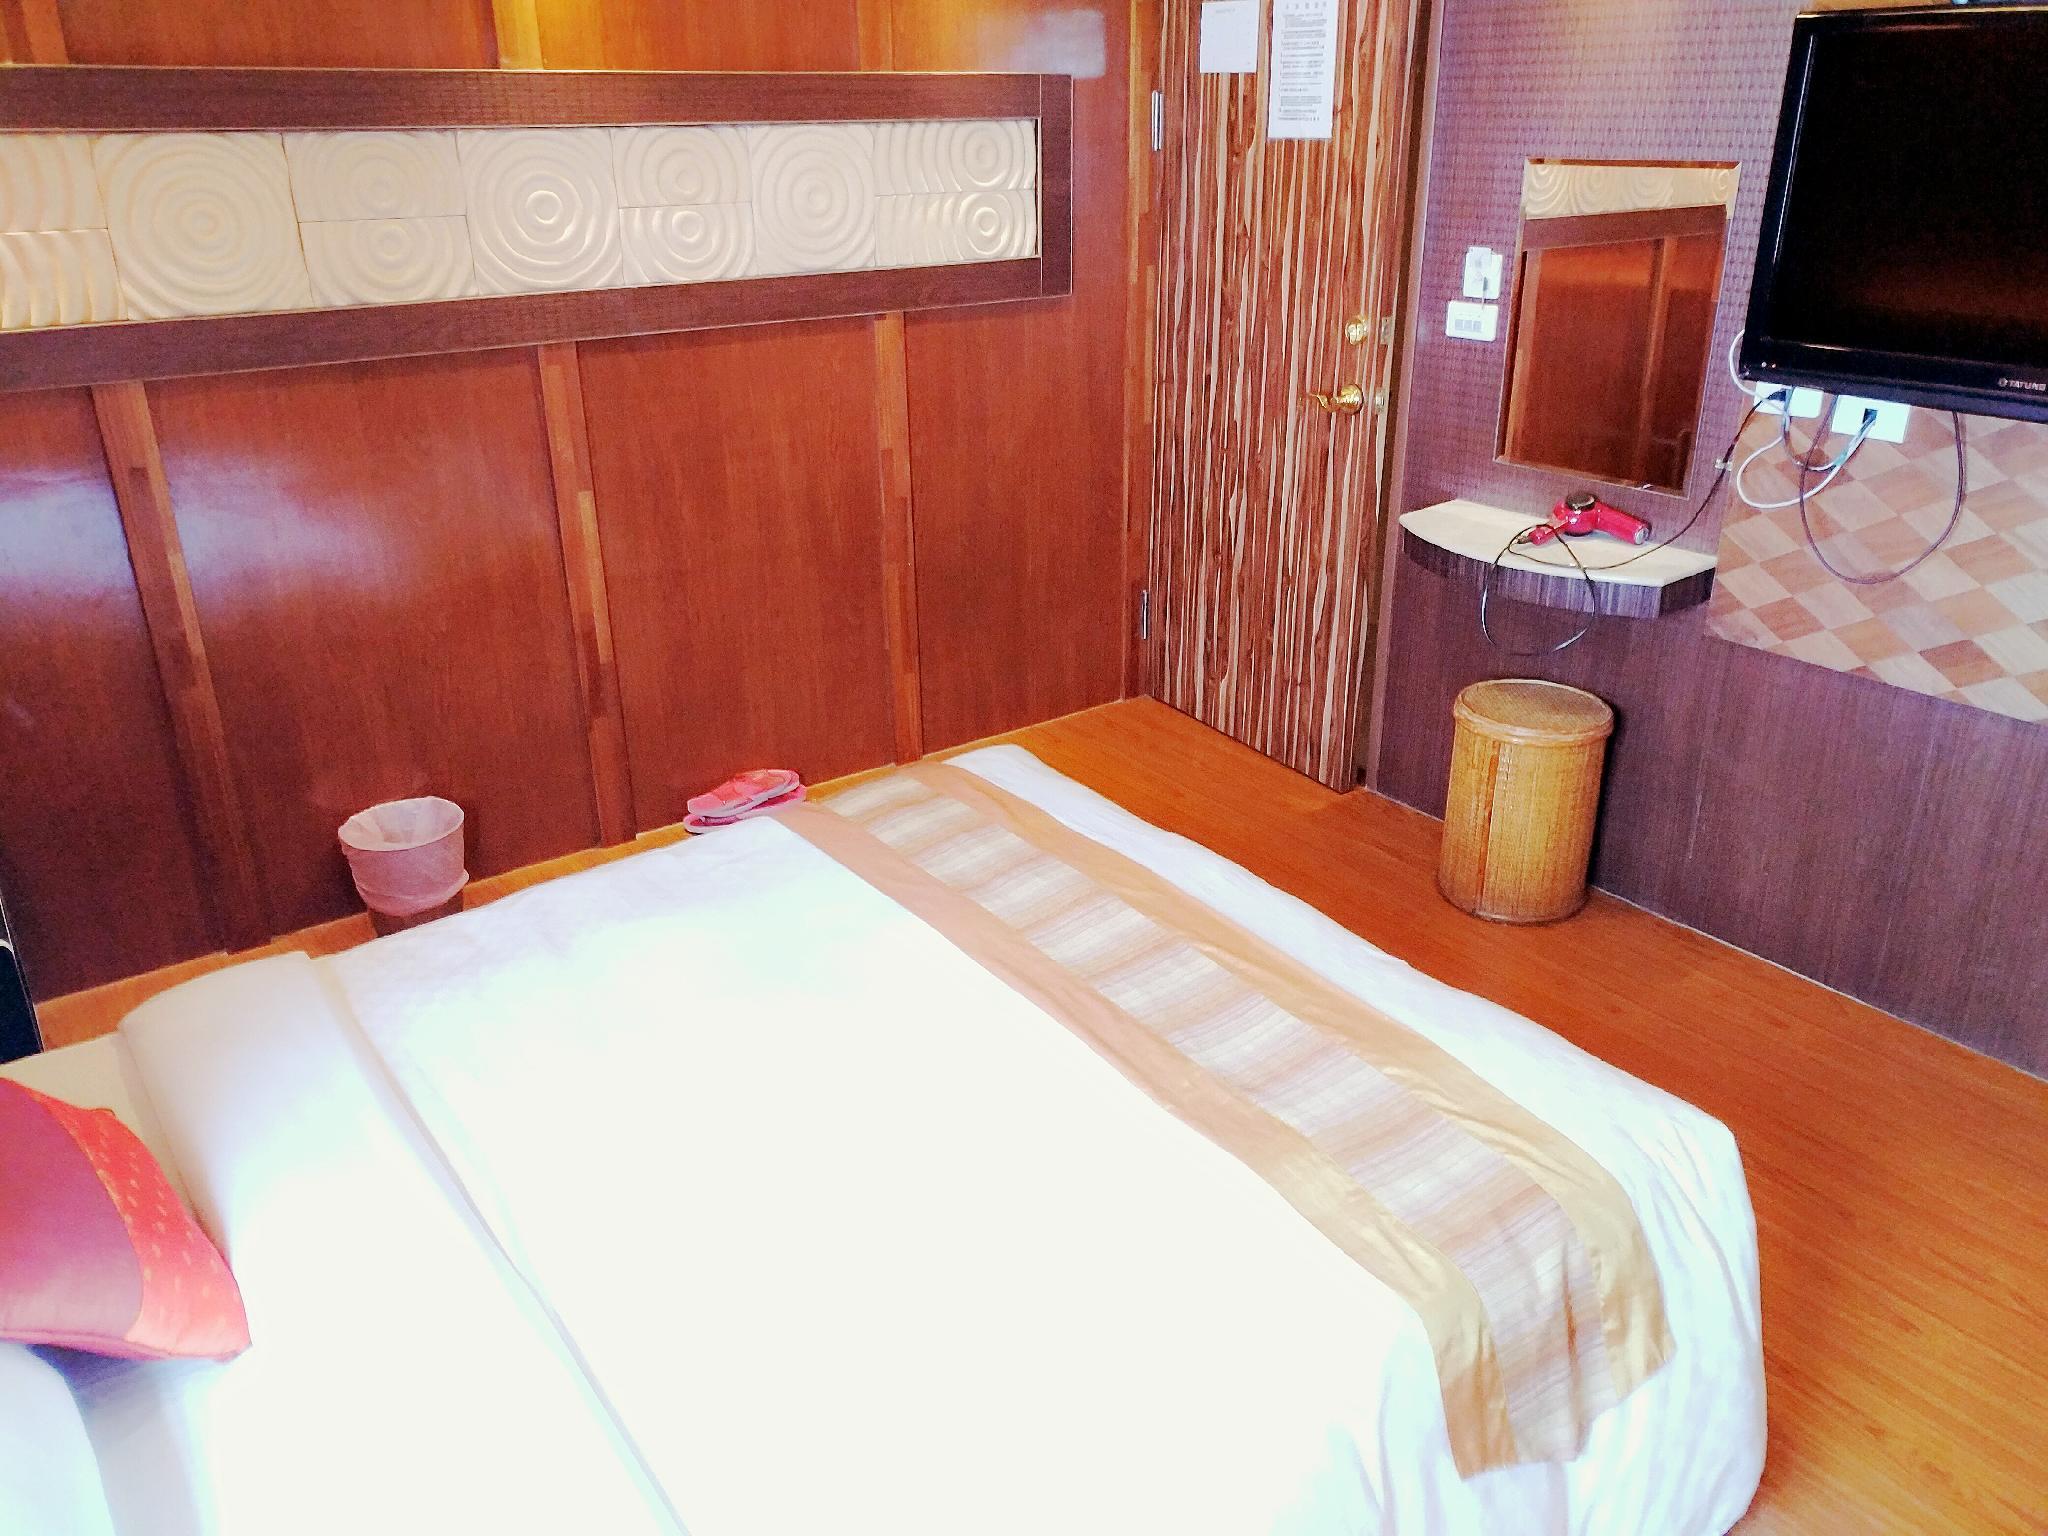 Kenting Street Honey Moon 2 People Room 503 With Bathtub